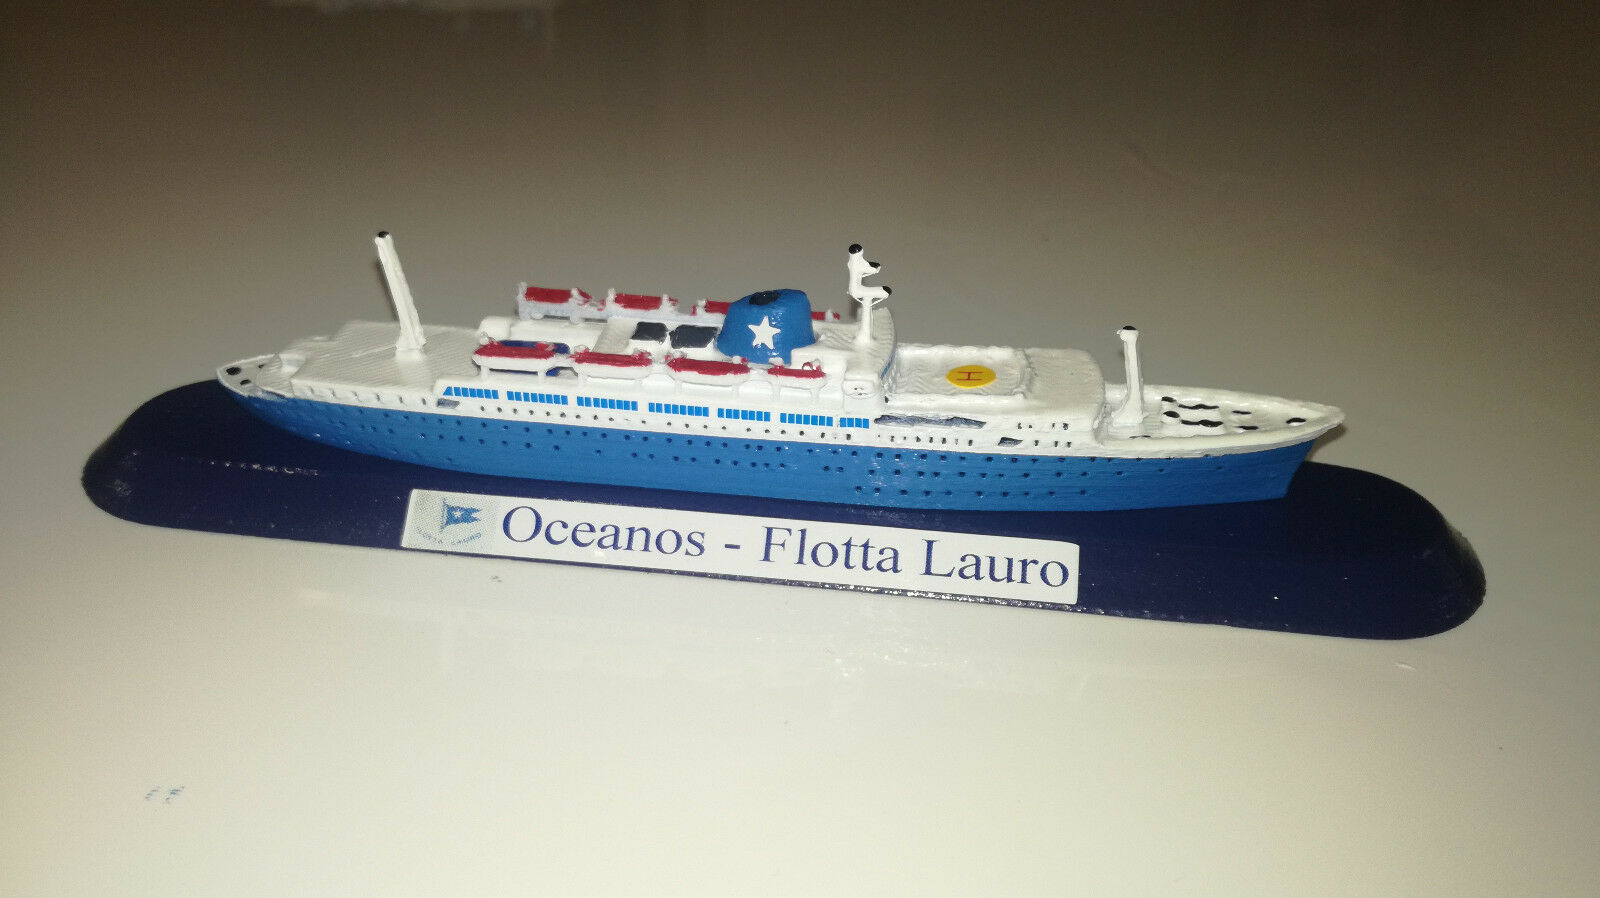 FLOTTA LAURRO modellllerlo m   v Oceanos scala 1 1250 Epirödiki Line Grecia